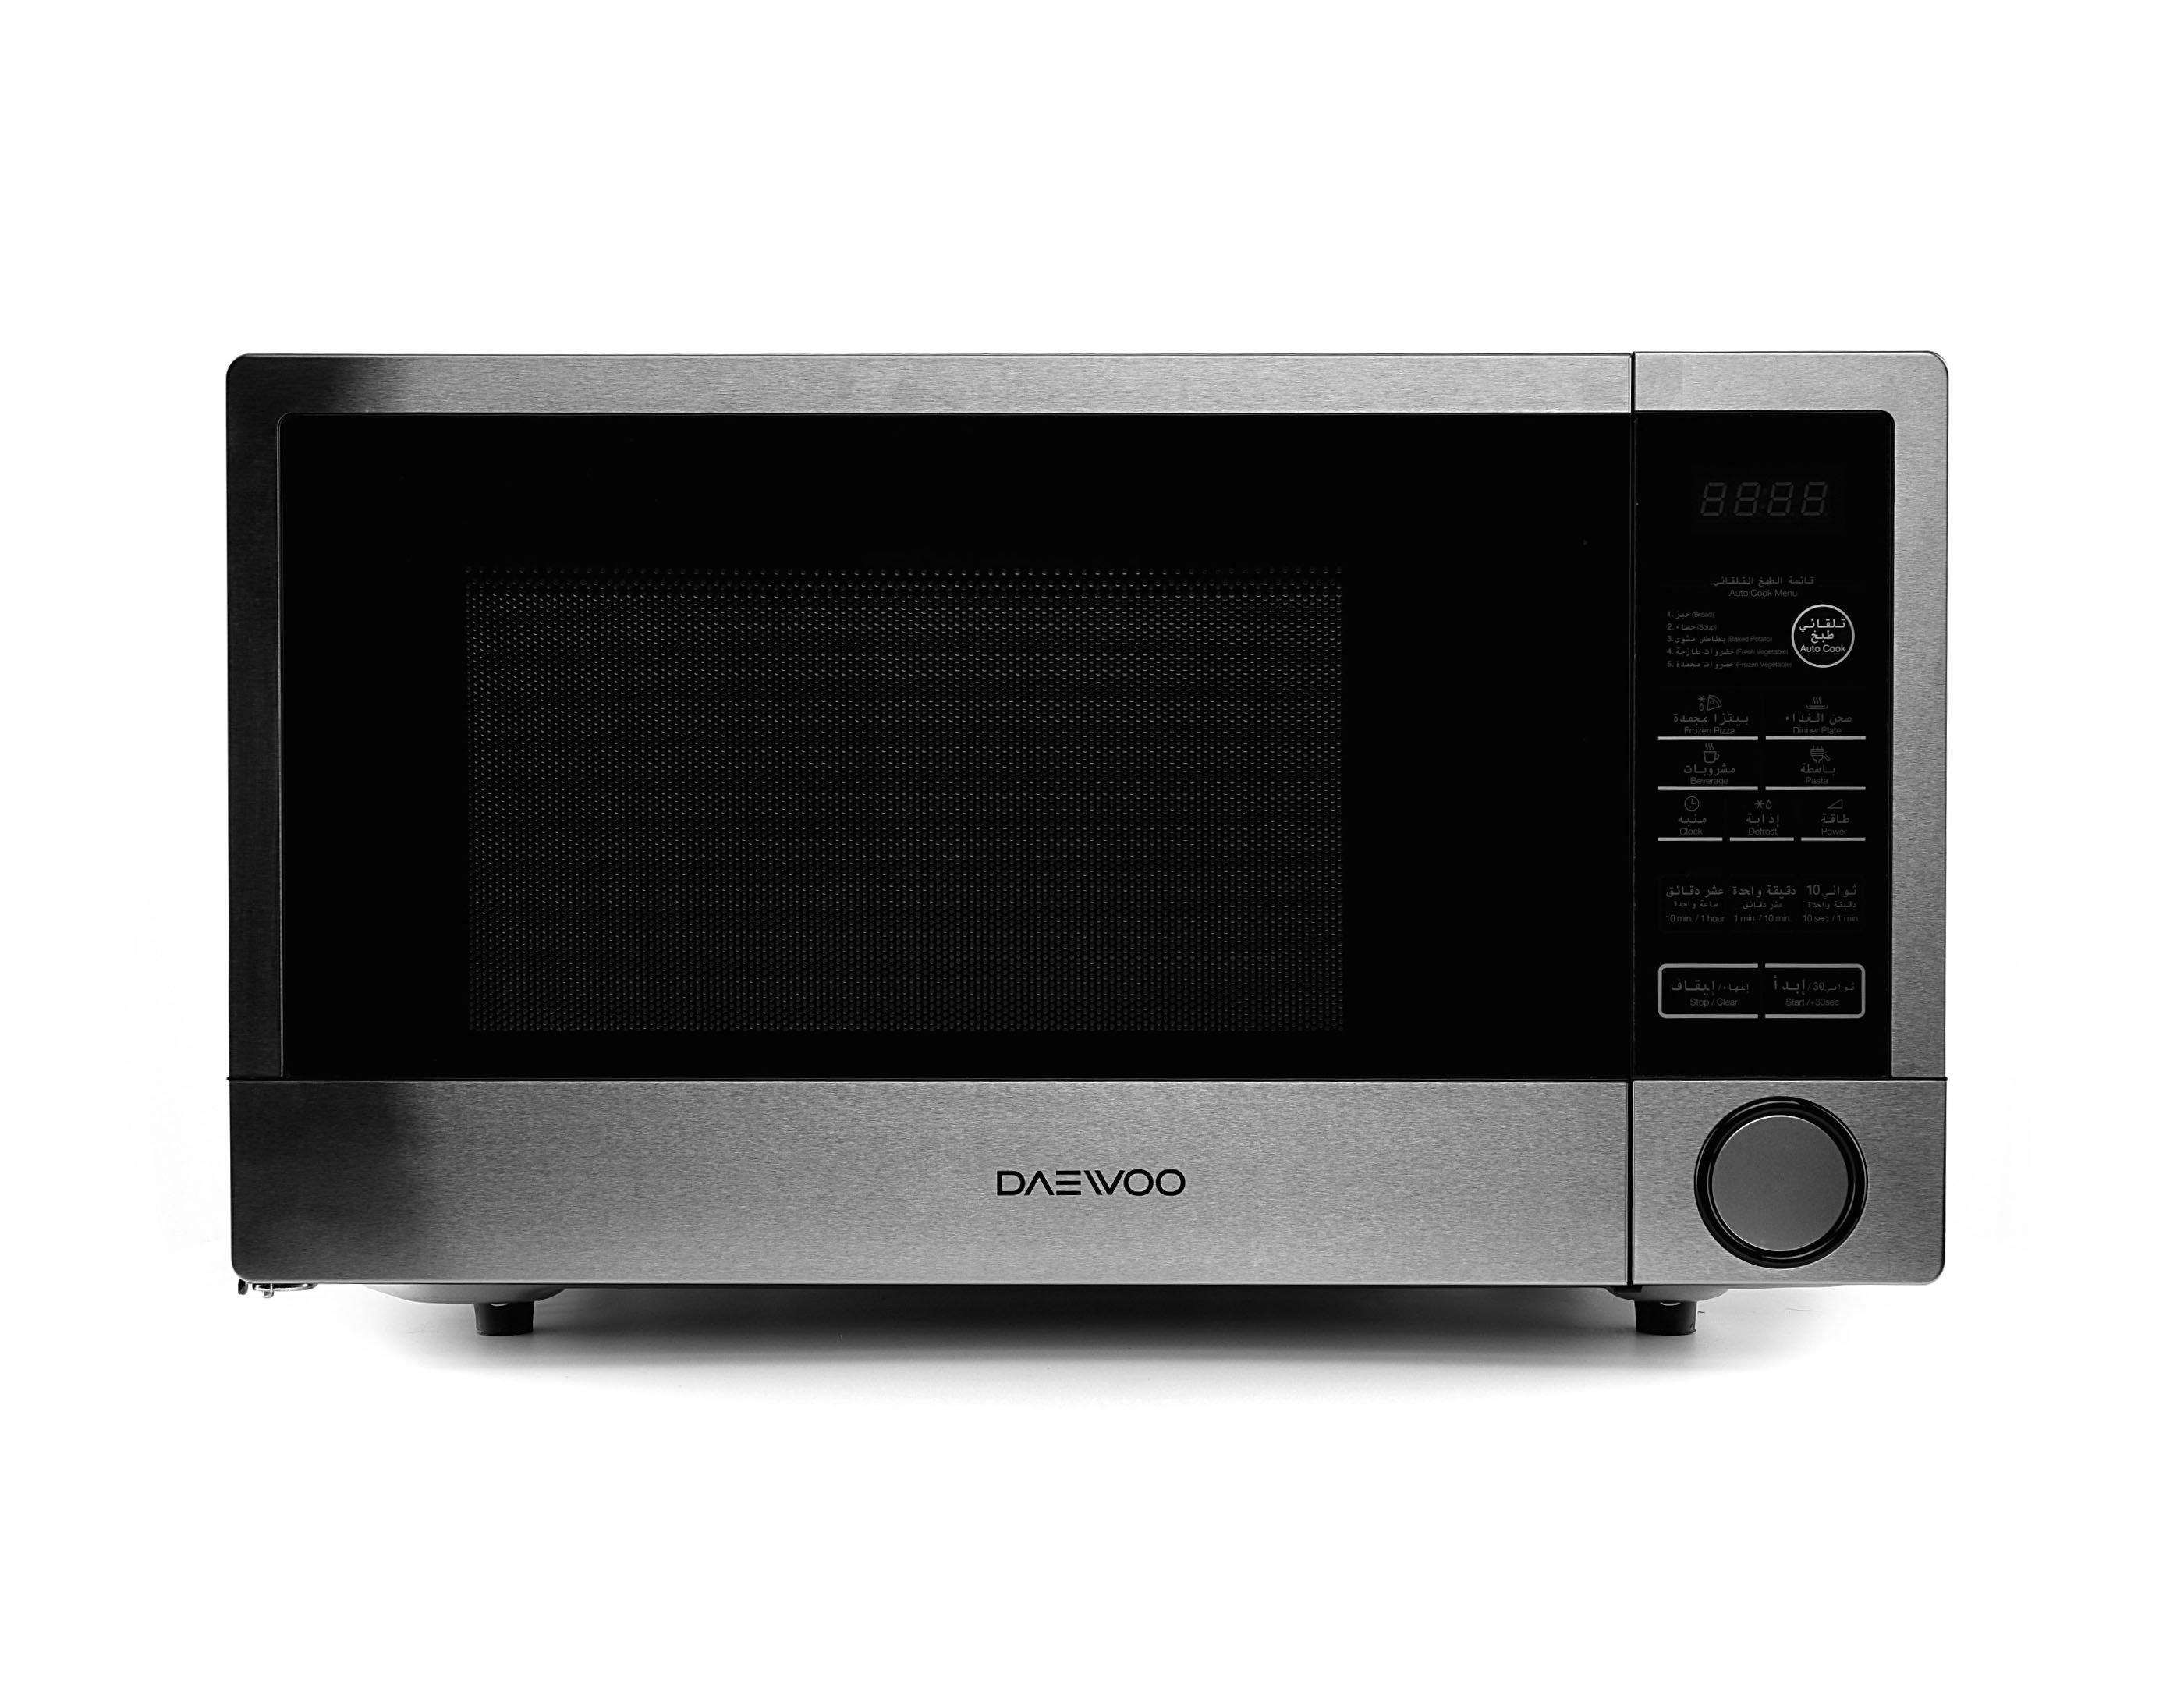 daewoo microwave 31l 1000w